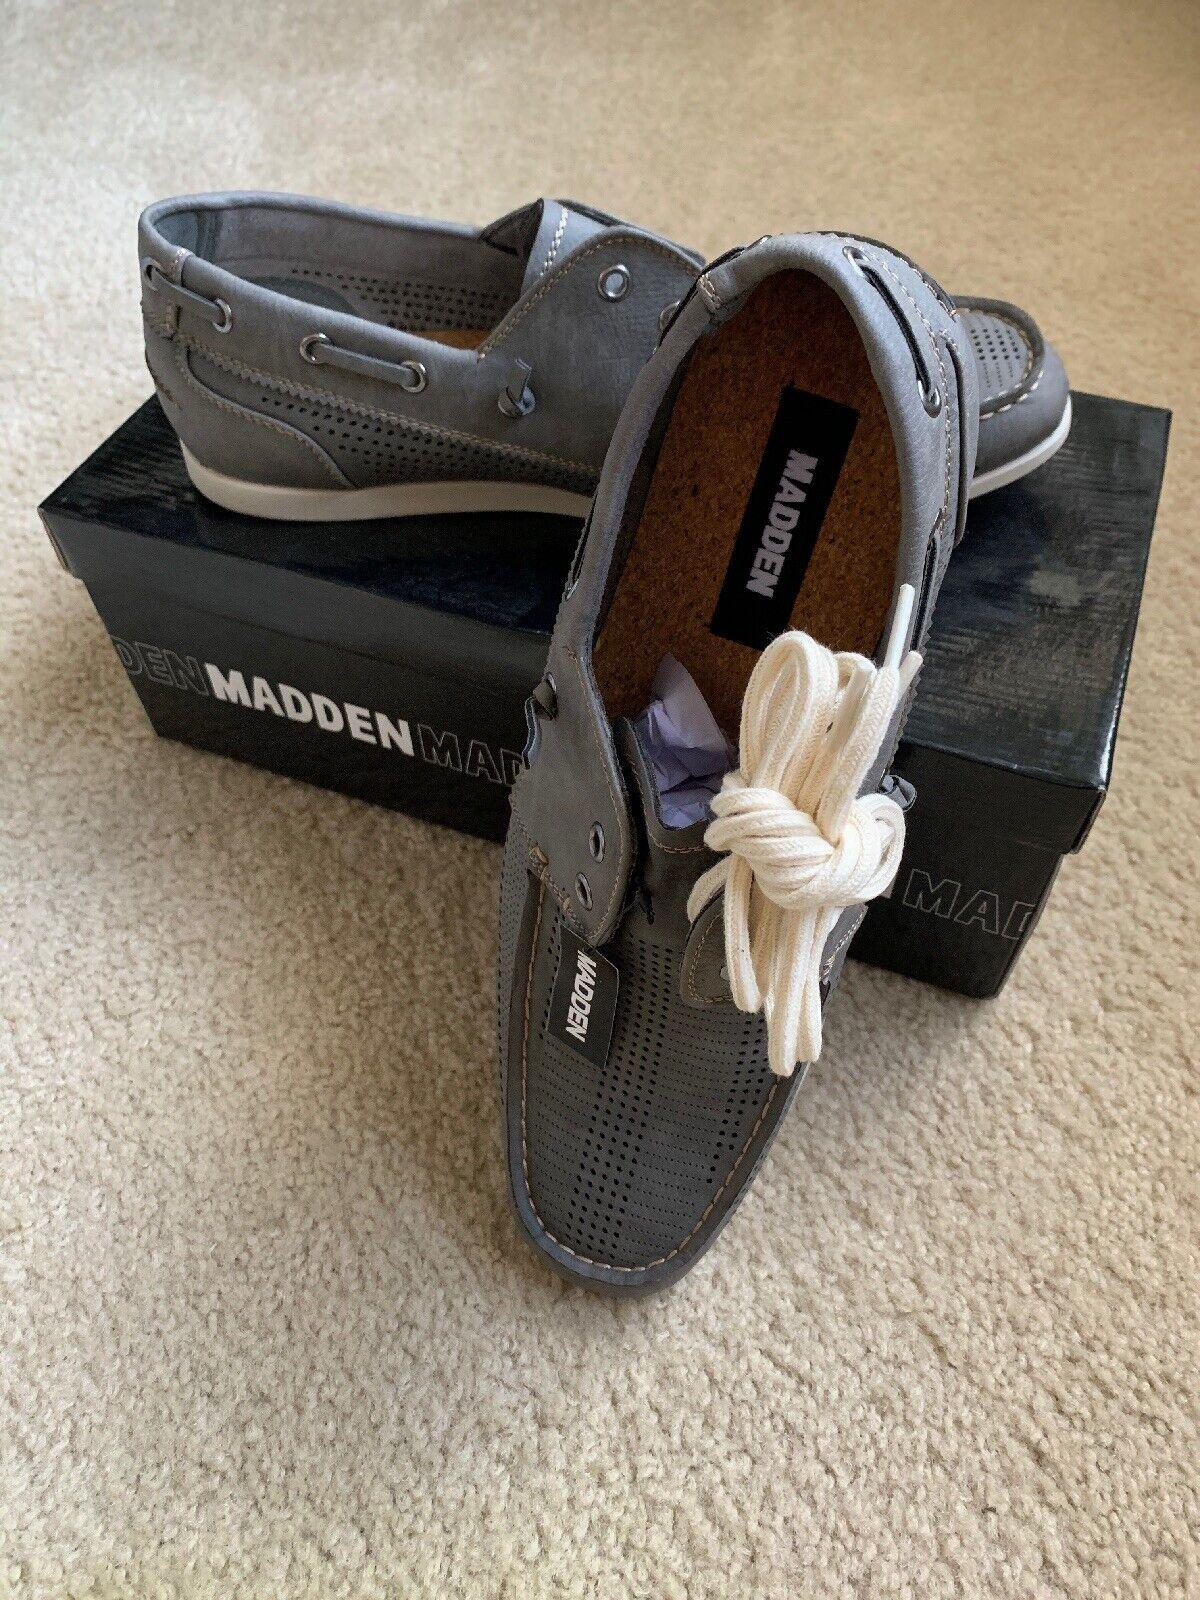 Steve Madden M-Guppi (Size 12)